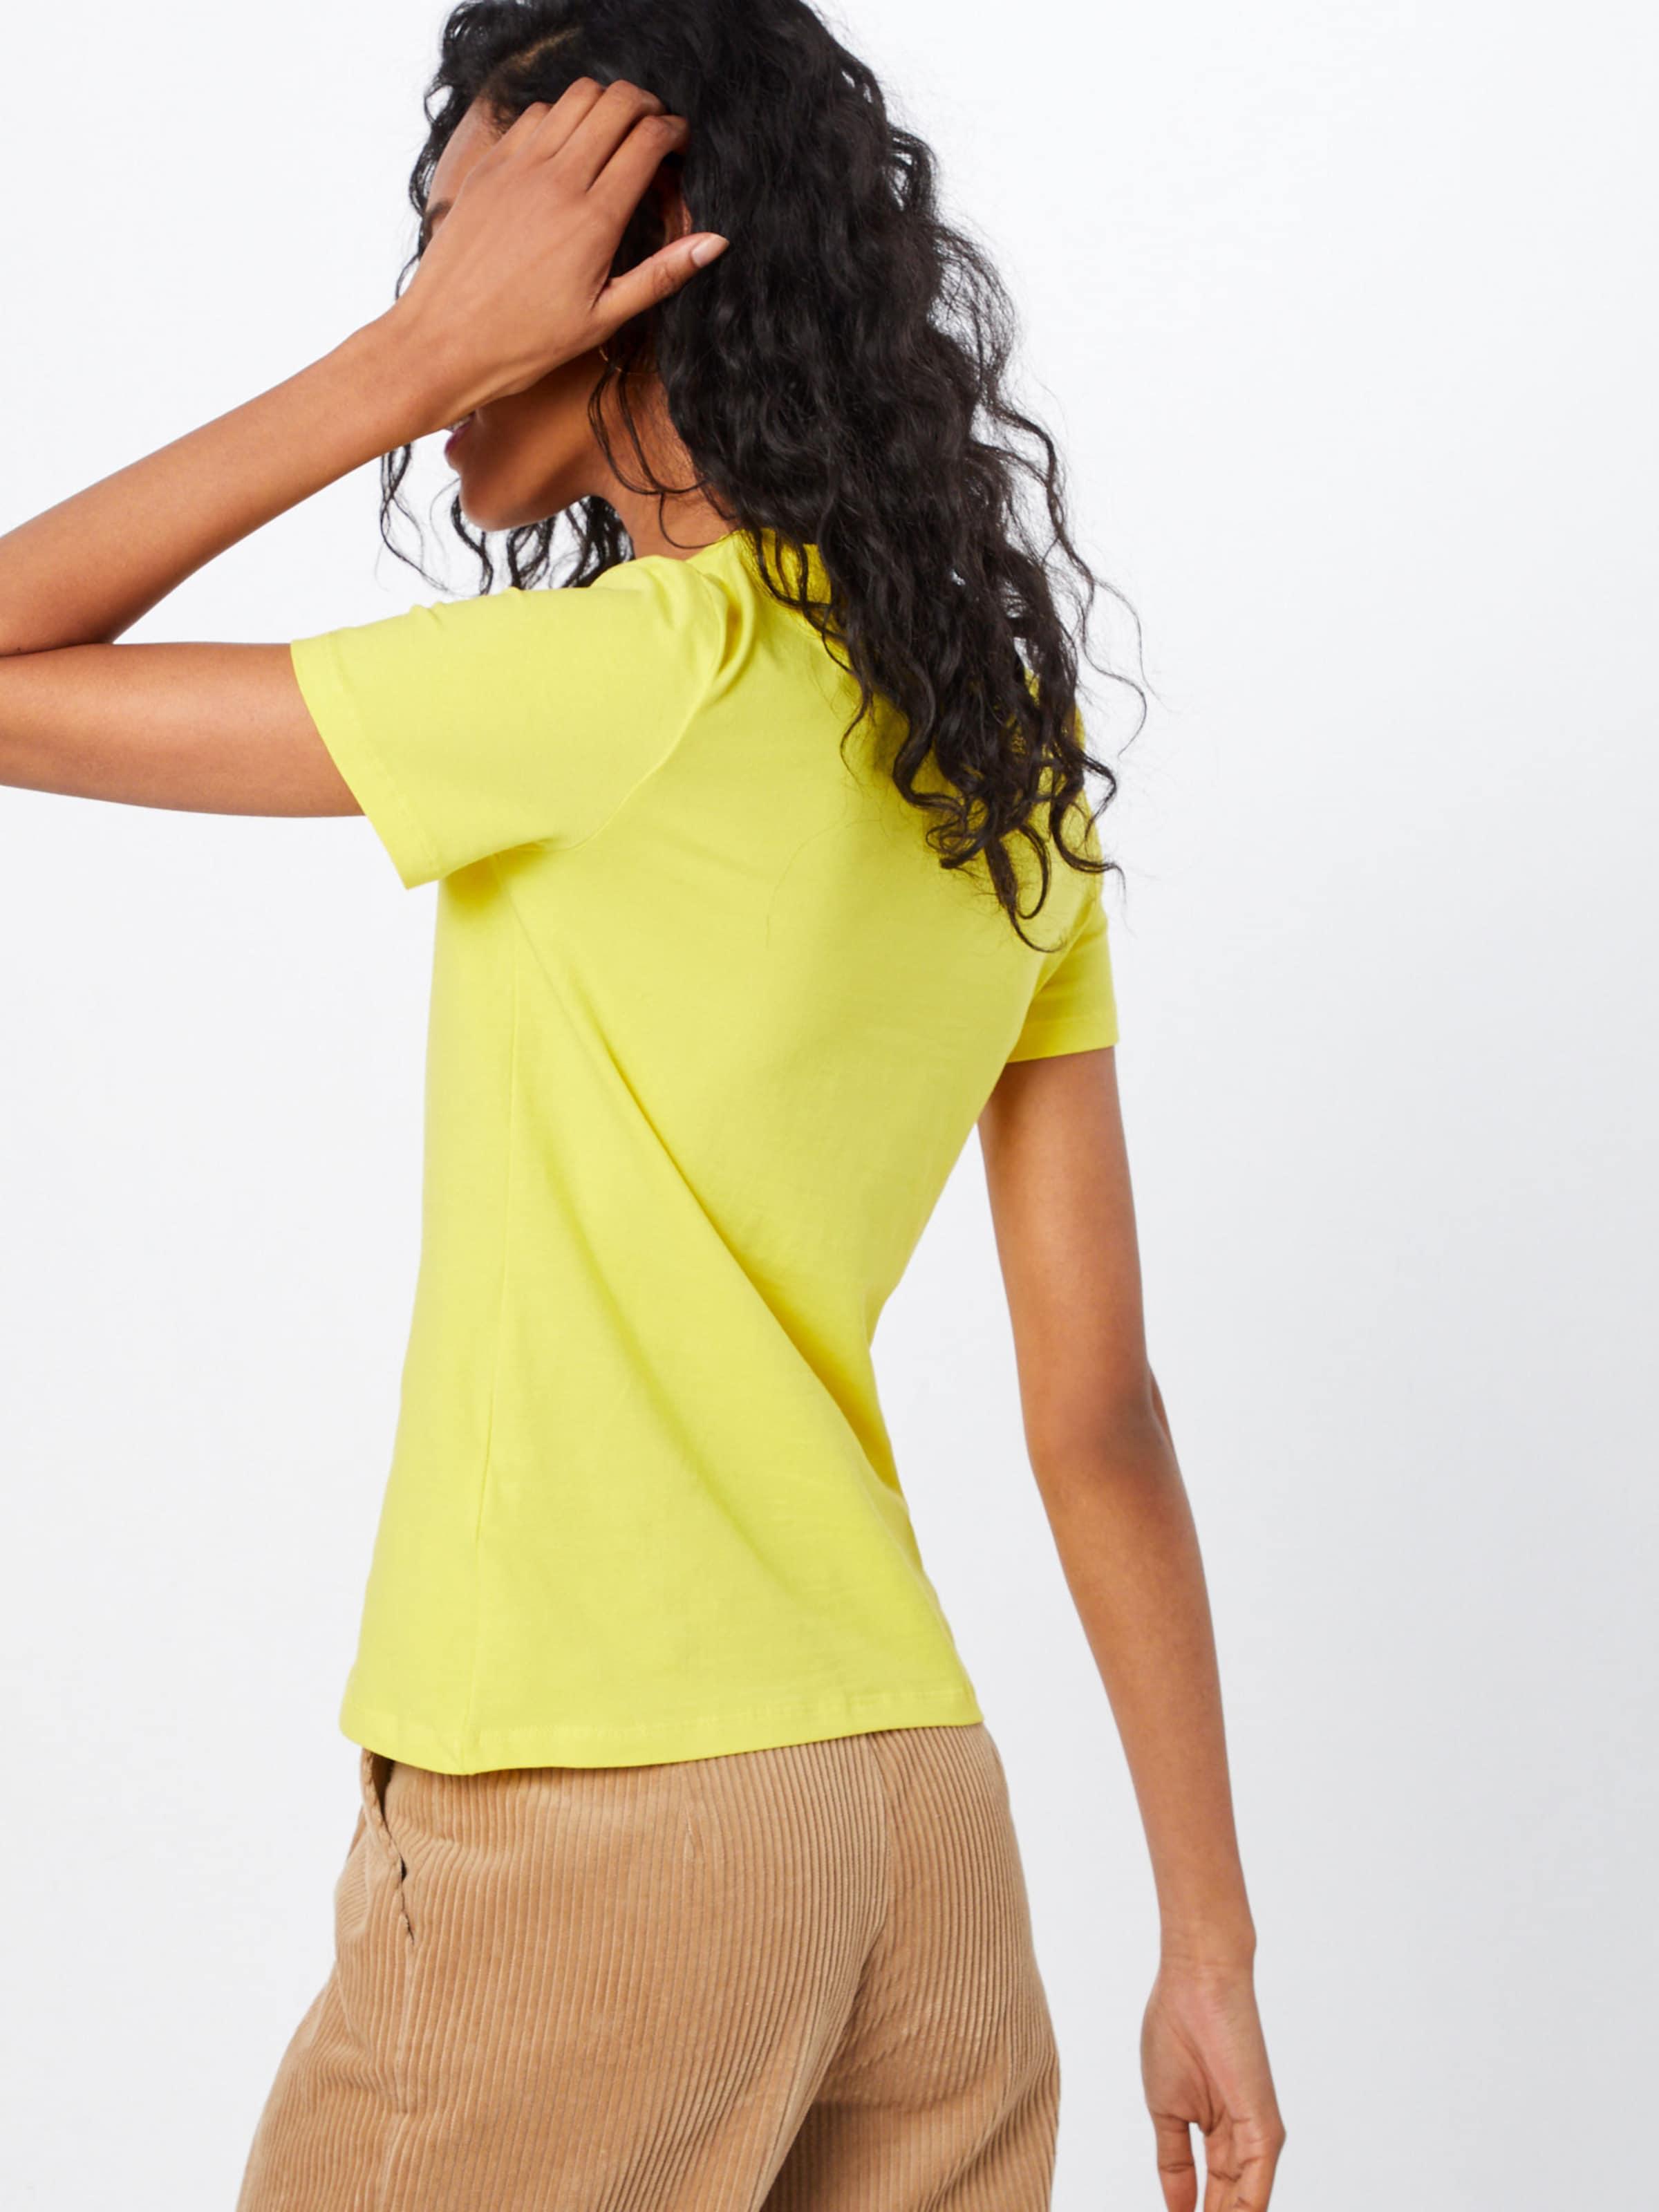 Street shirt One Gelb 'qr Rhea' In T NPZnwOX8k0